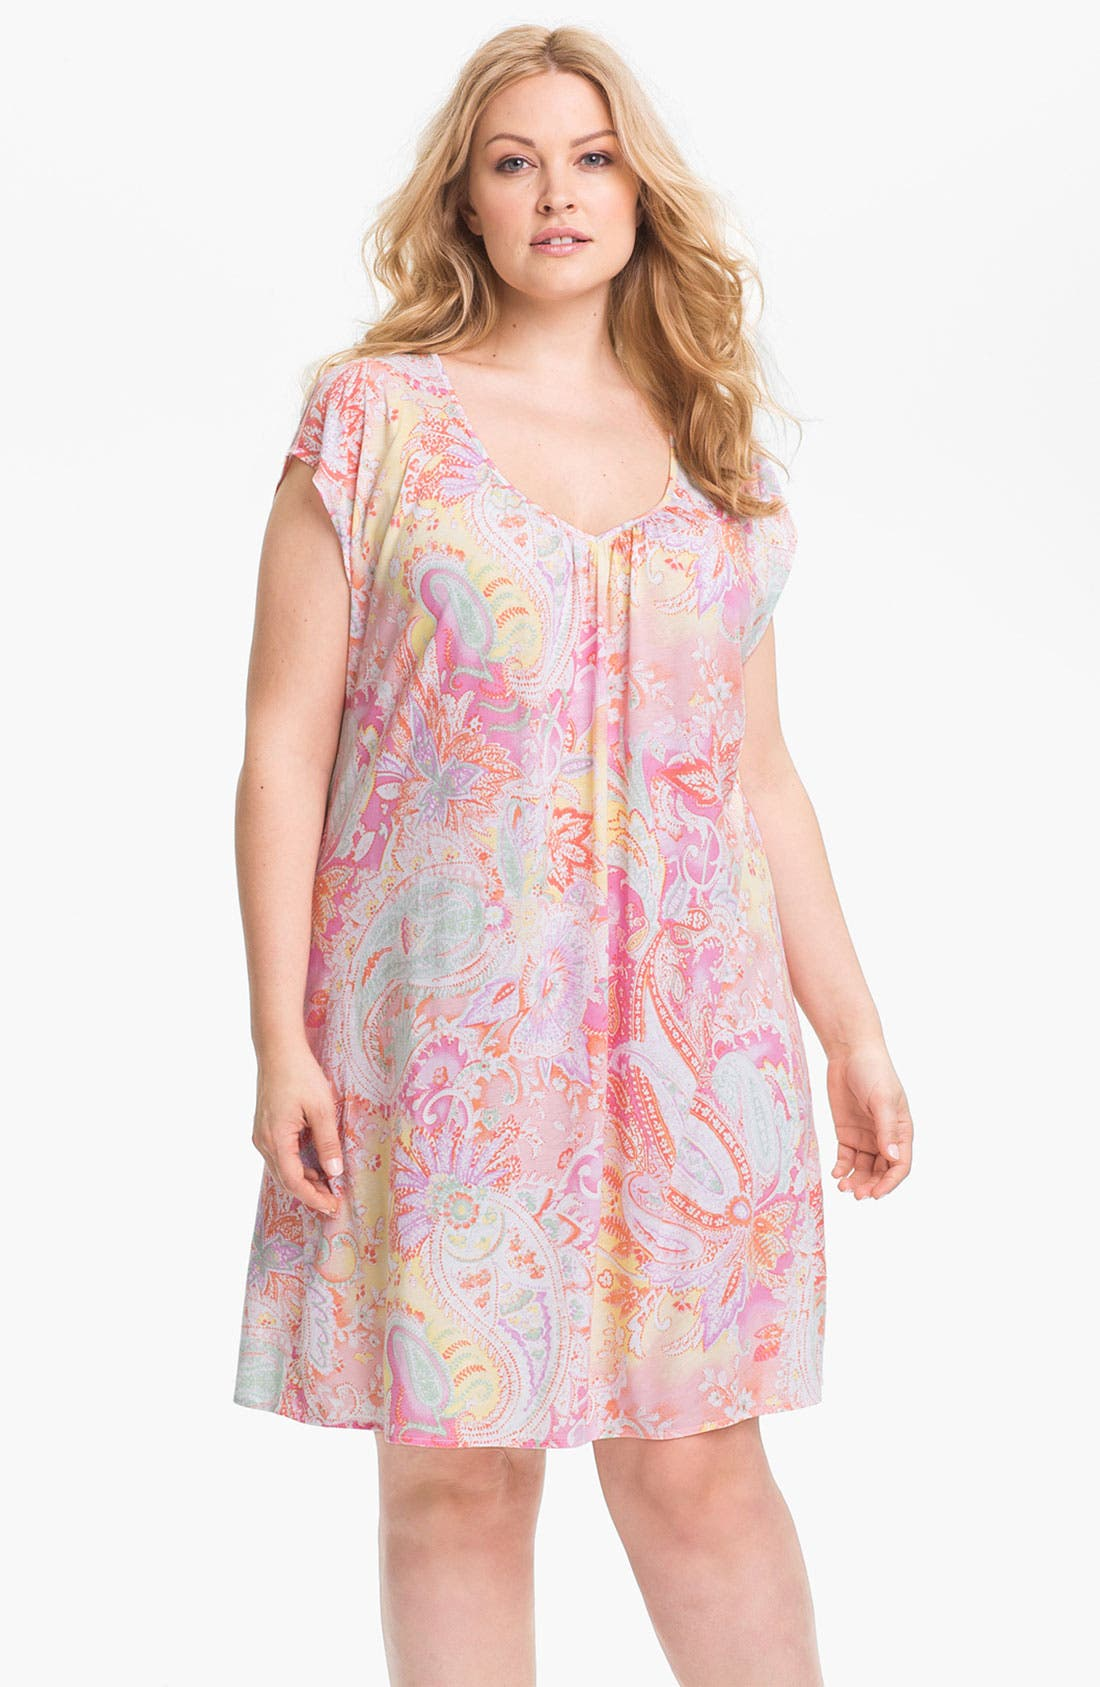 Main Image - Lauren Ralph Lauren Sleepwear Knit Nightgown (Plus)